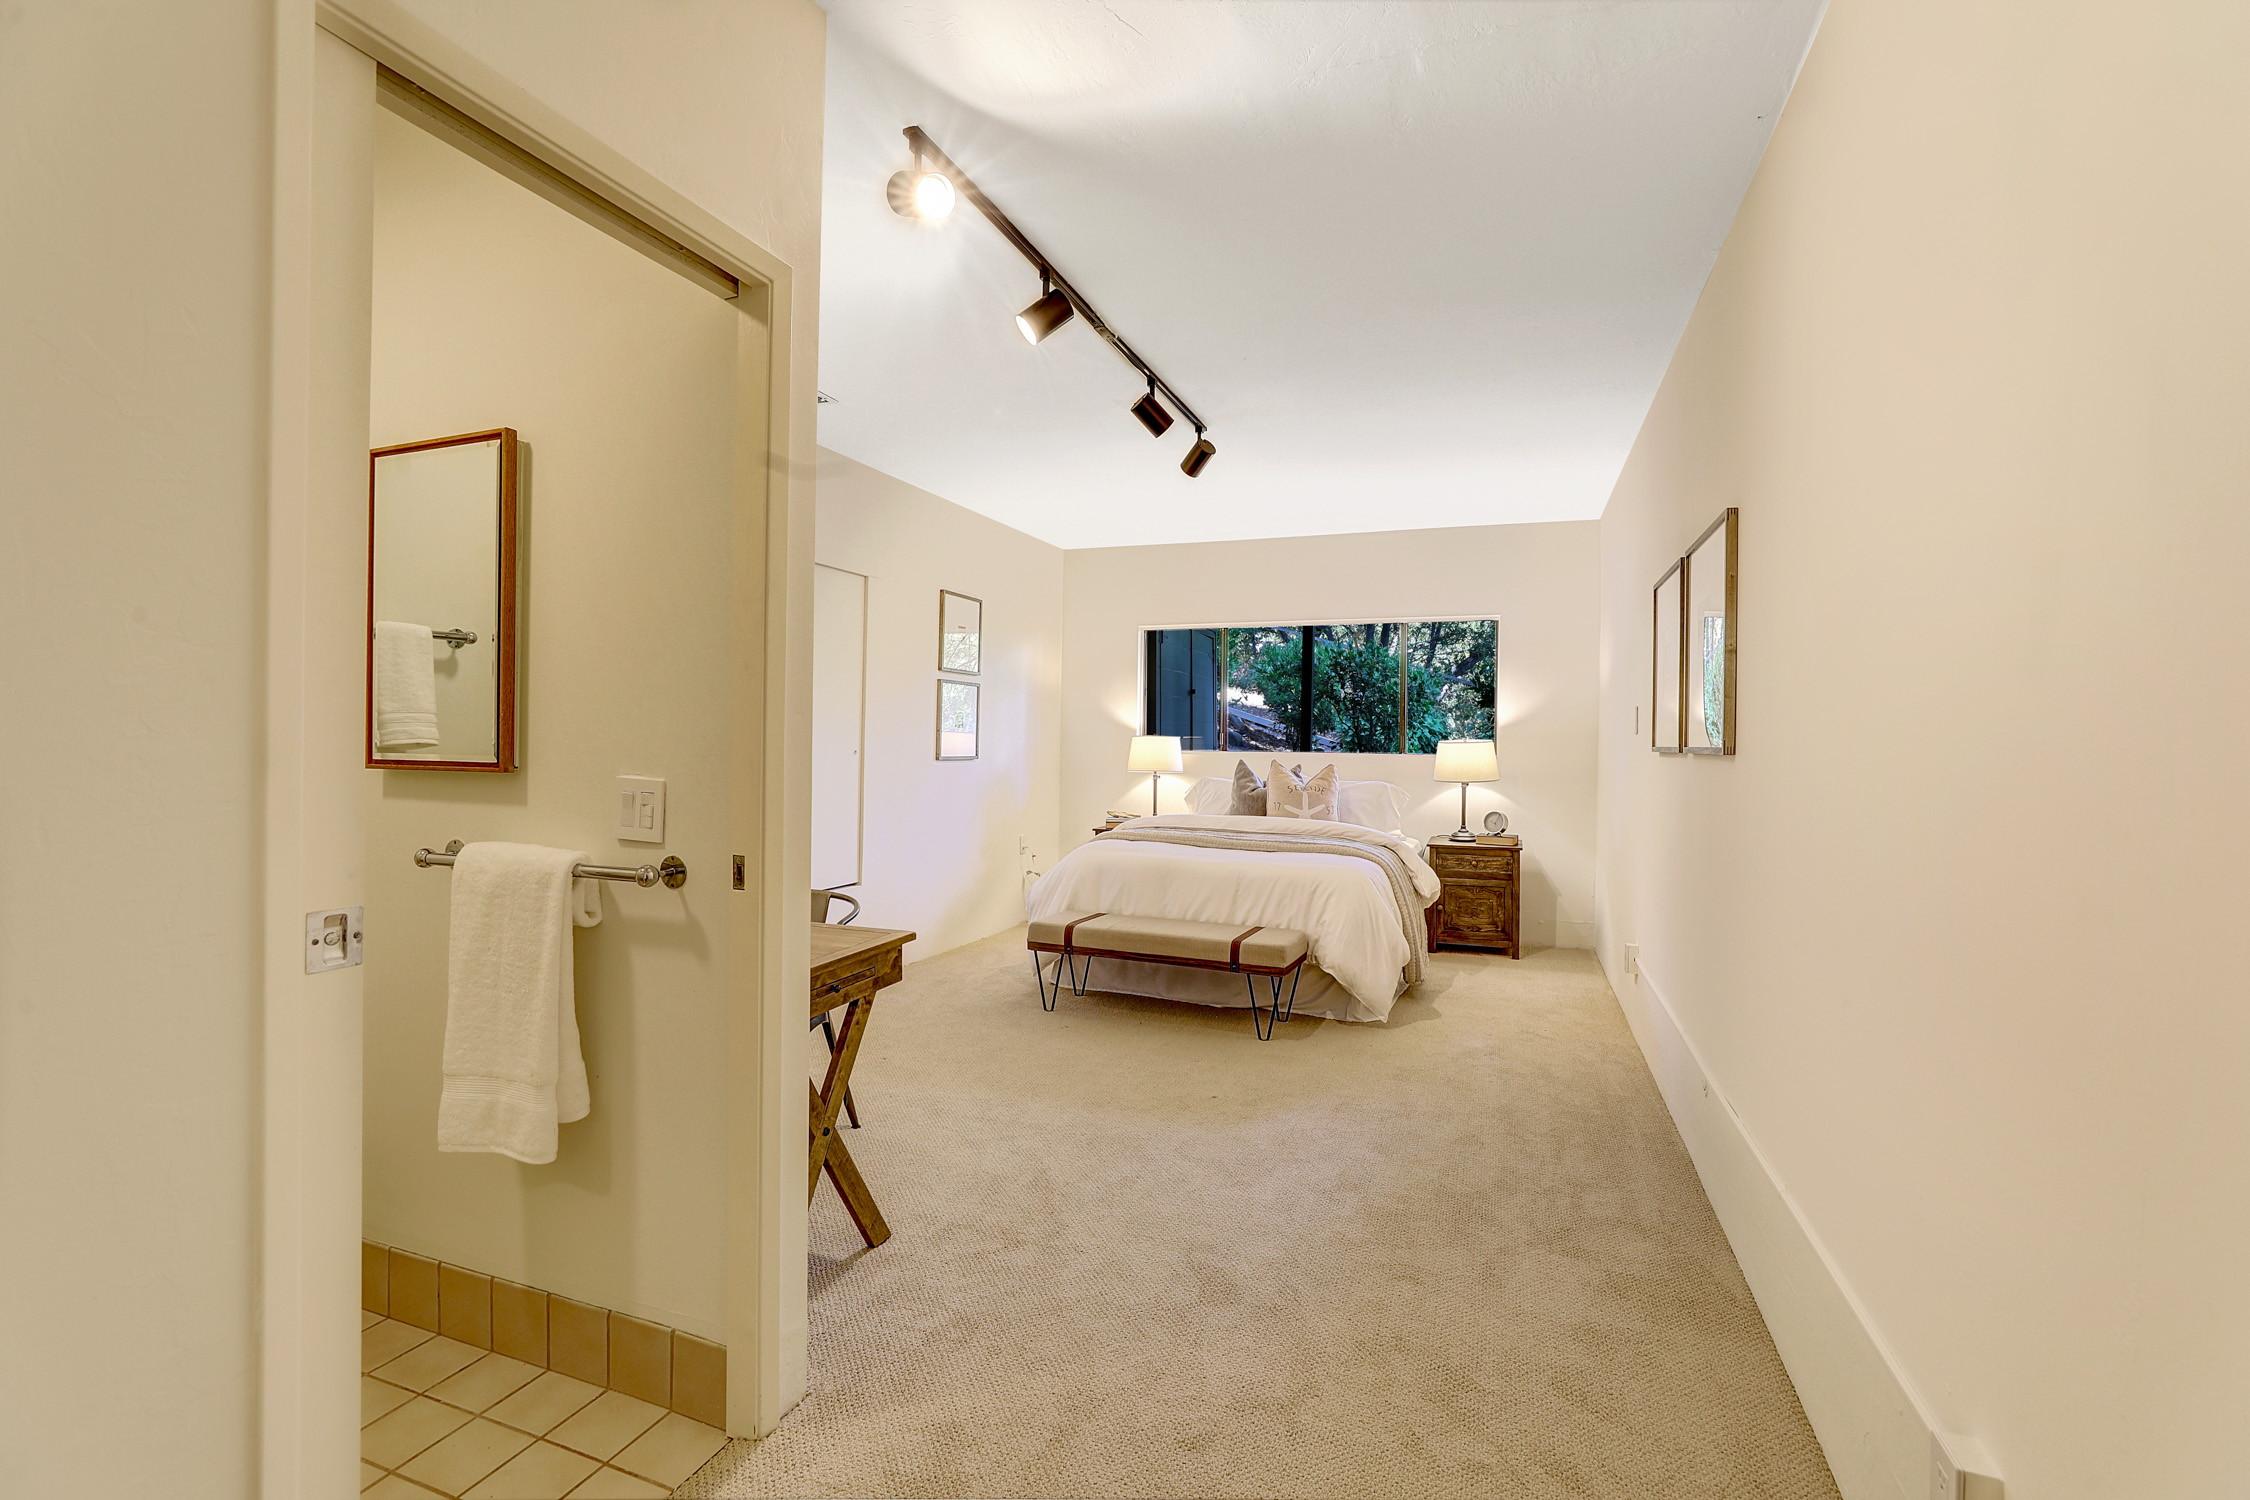 16Dorian 53 MLSSan Rafael Real Estate - Listed by Julia Fitzpatrick + Allie Fornesi Team Own Marin County .jpg